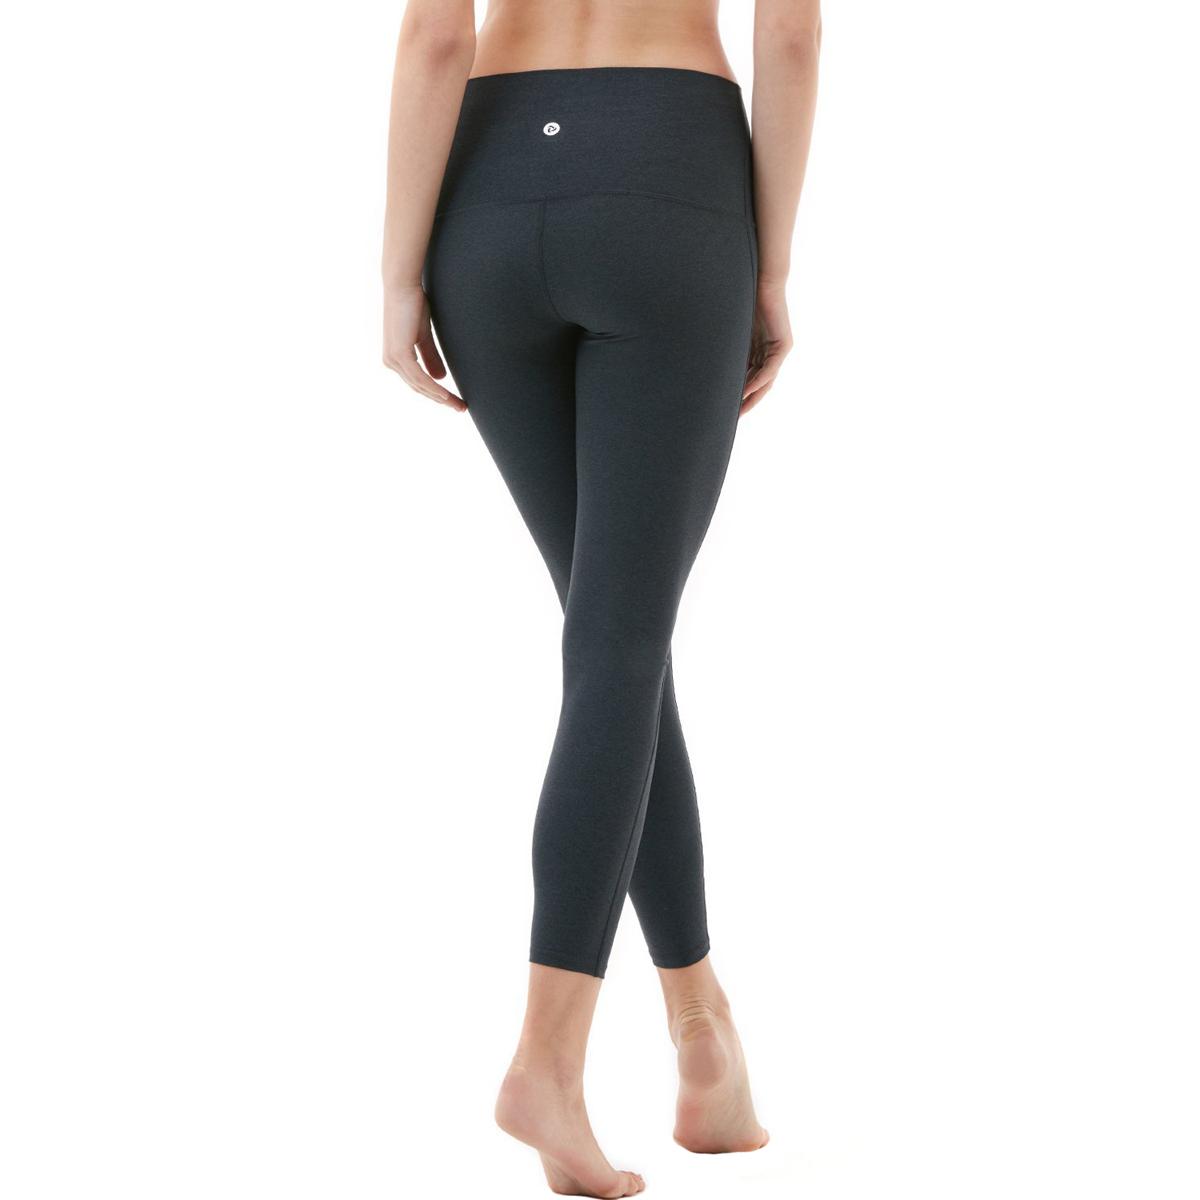 thumbnail 16 - TSLA Tesla FYP42 Women's High-Waisted Ultra-Stretch Tummy Control Yoga Pants